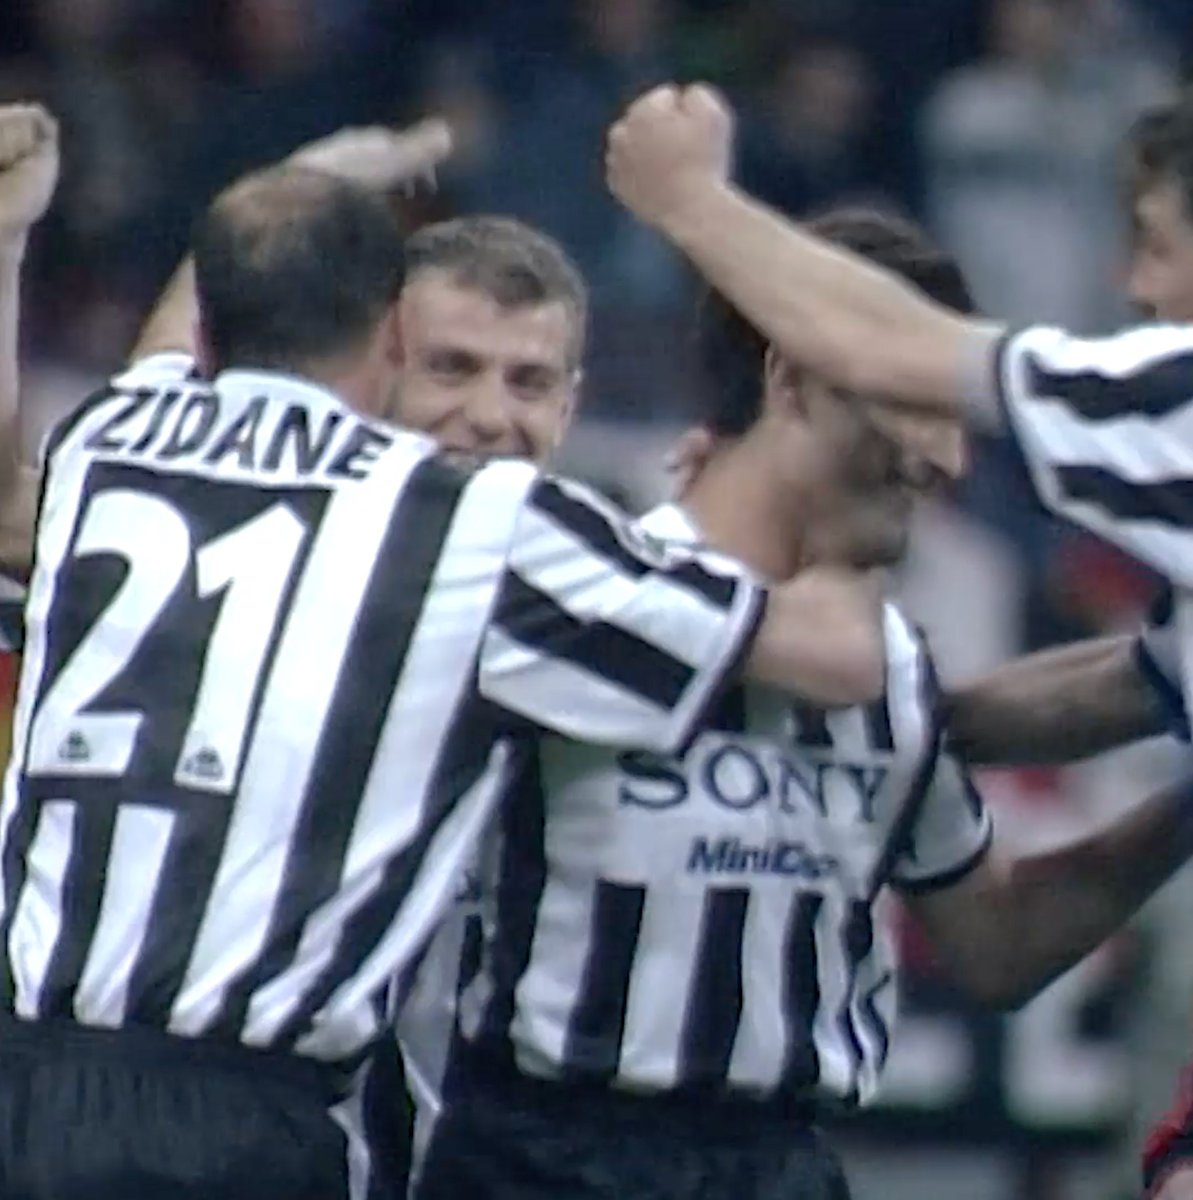 #UnDiaComoHoy... ¡GOLEADA HISTÓRICA en San Siro! 🤯  👊 19' Jugovic 🎩 32' Zidane 🎯 50' Jugovic 💥 71' Vieri 🔝 73' Amoruso 🔥 81' Vieri